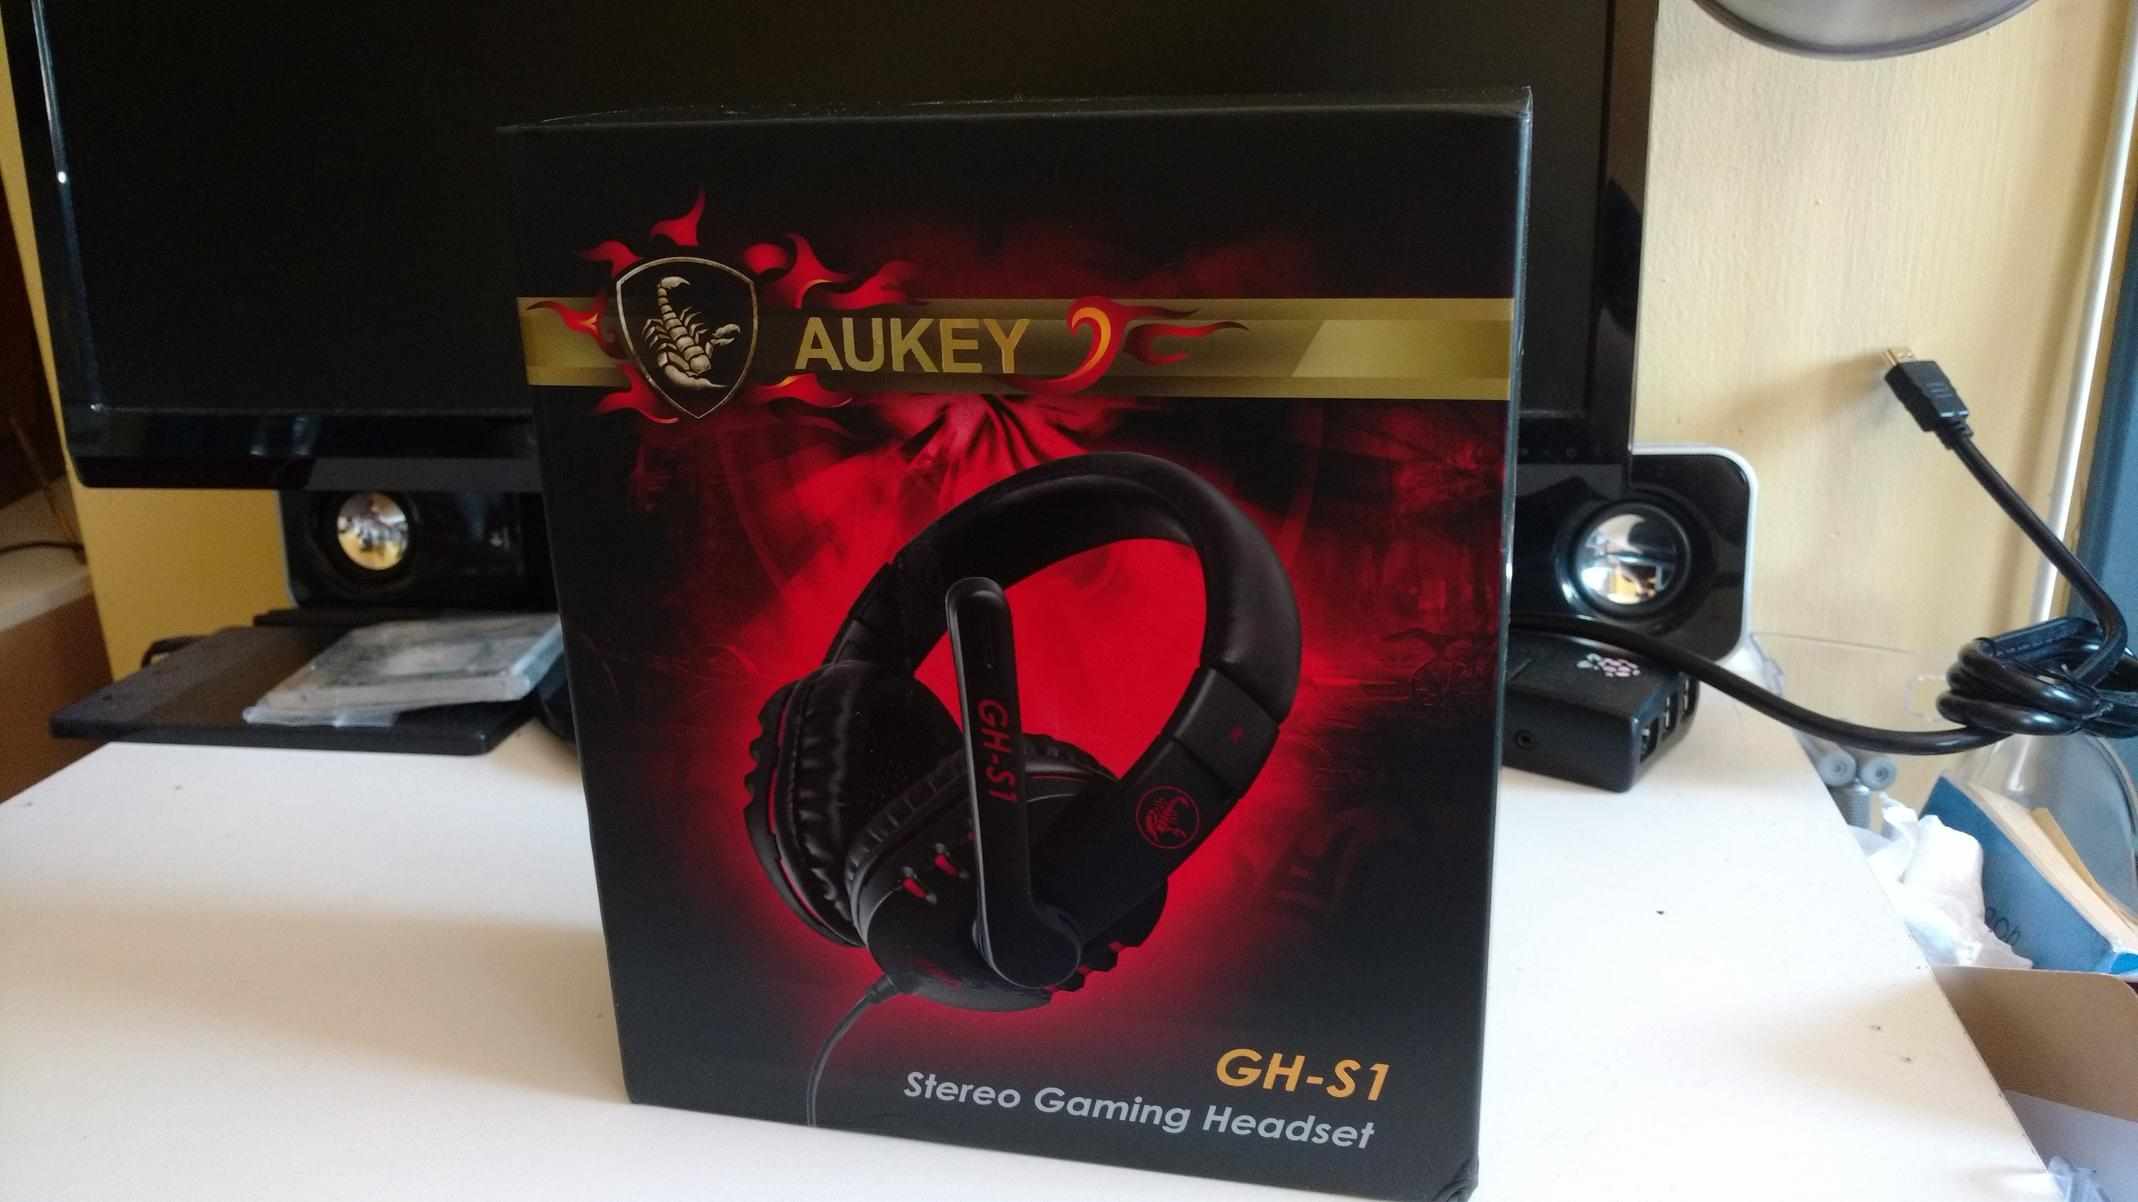 Aukey GH-S1 - Box